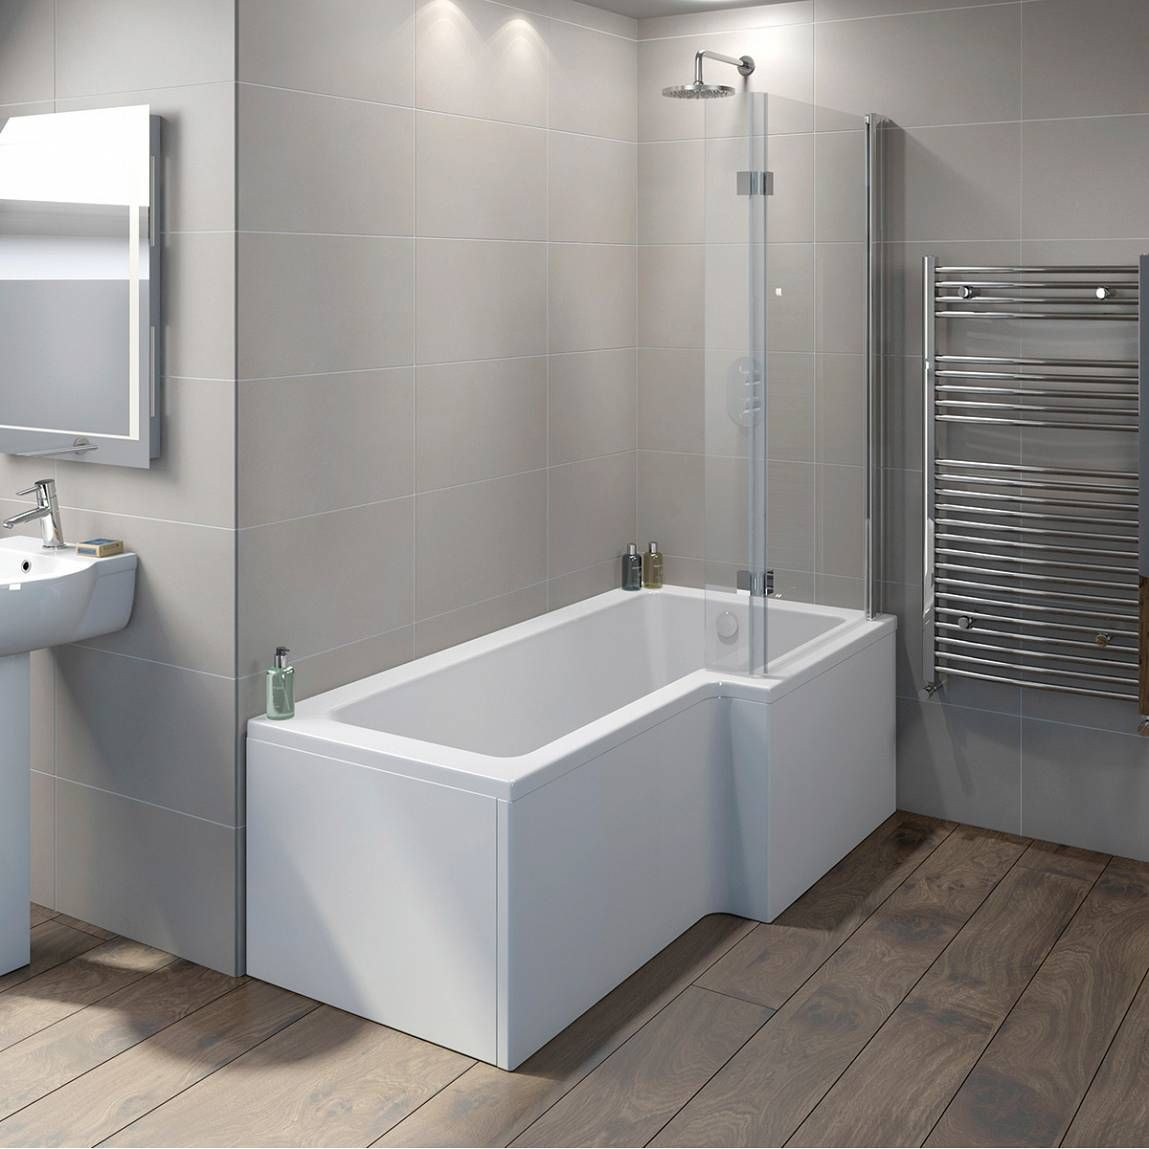 Boston Shower Bath 1500 x 850 RH with 8mm Hinged Screen - Victoria ...